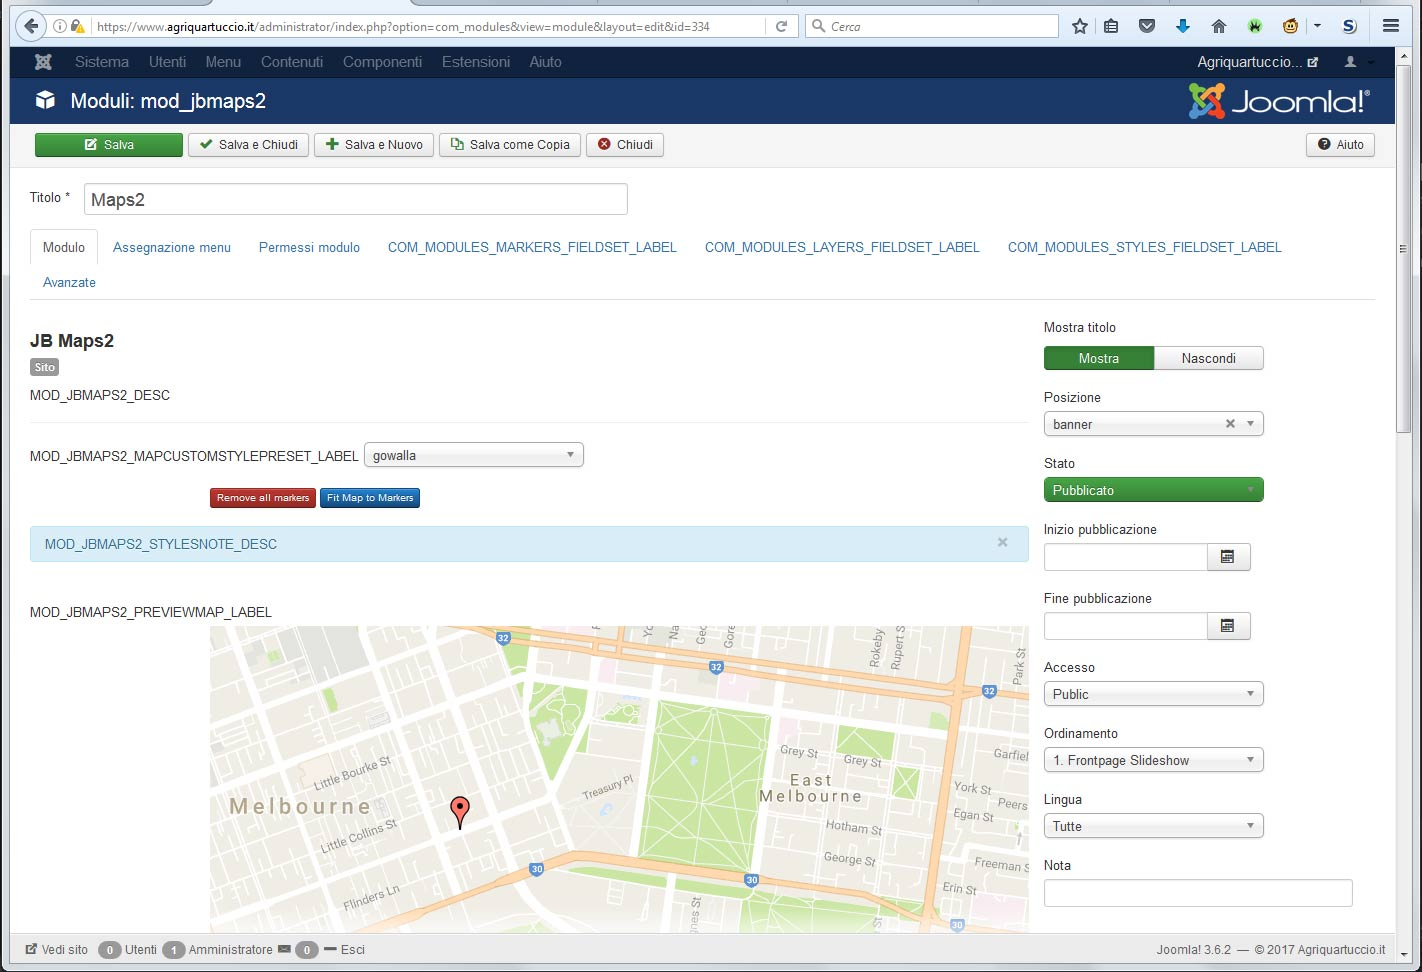 Maps2-module-of-Lifestyle2.jpg